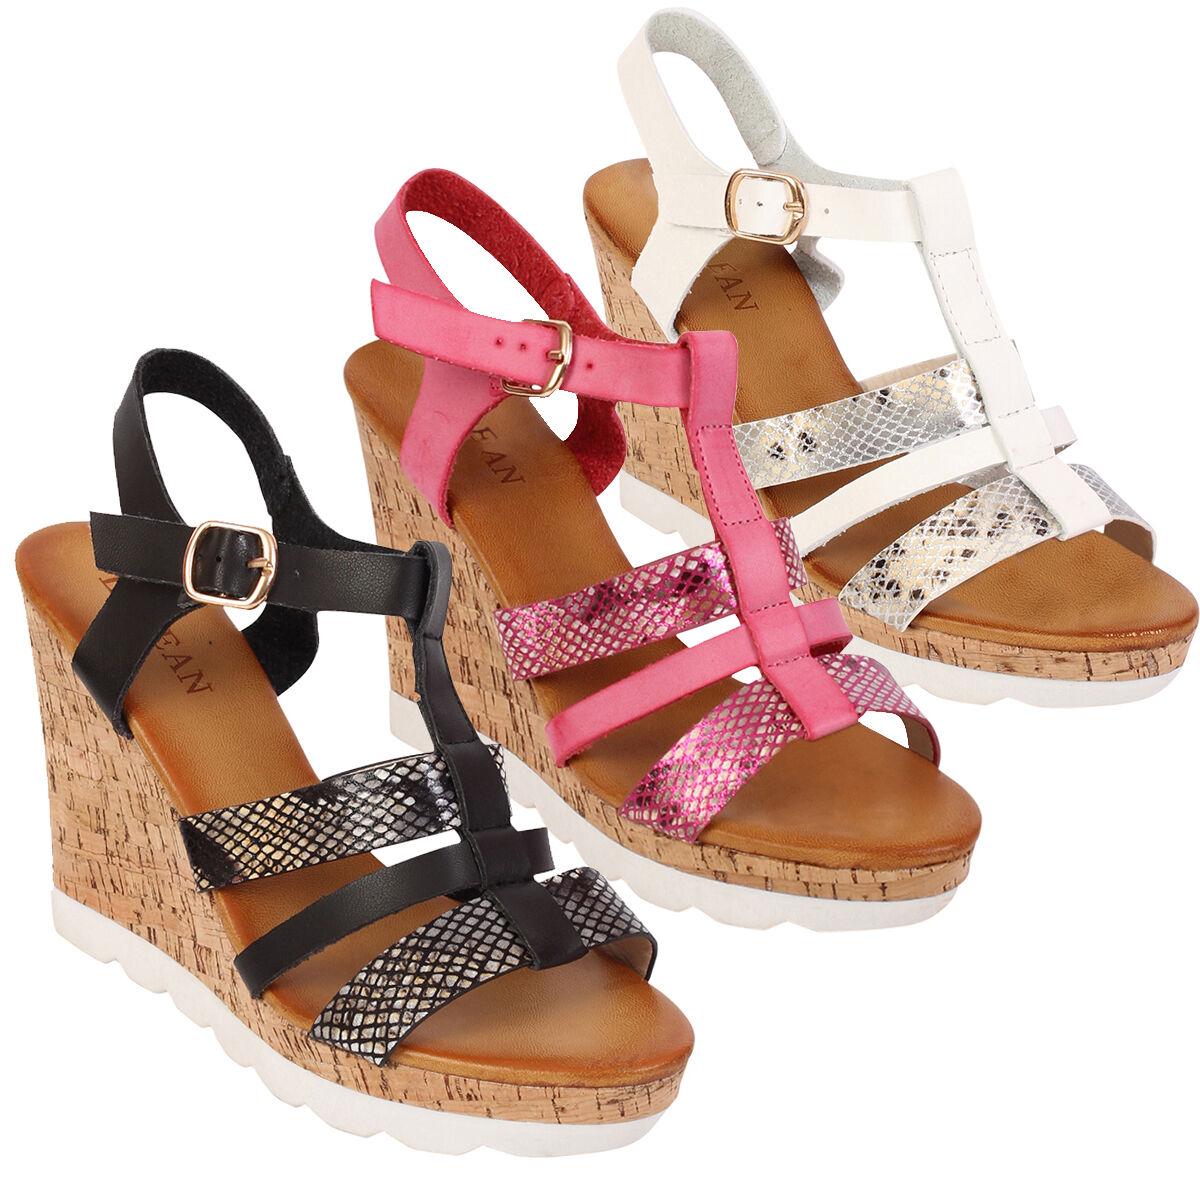 Ladies Cork Wedge Heel Shoes Strappy Sling Sandals Back Open Toes Summer Sandals Sling 359c11